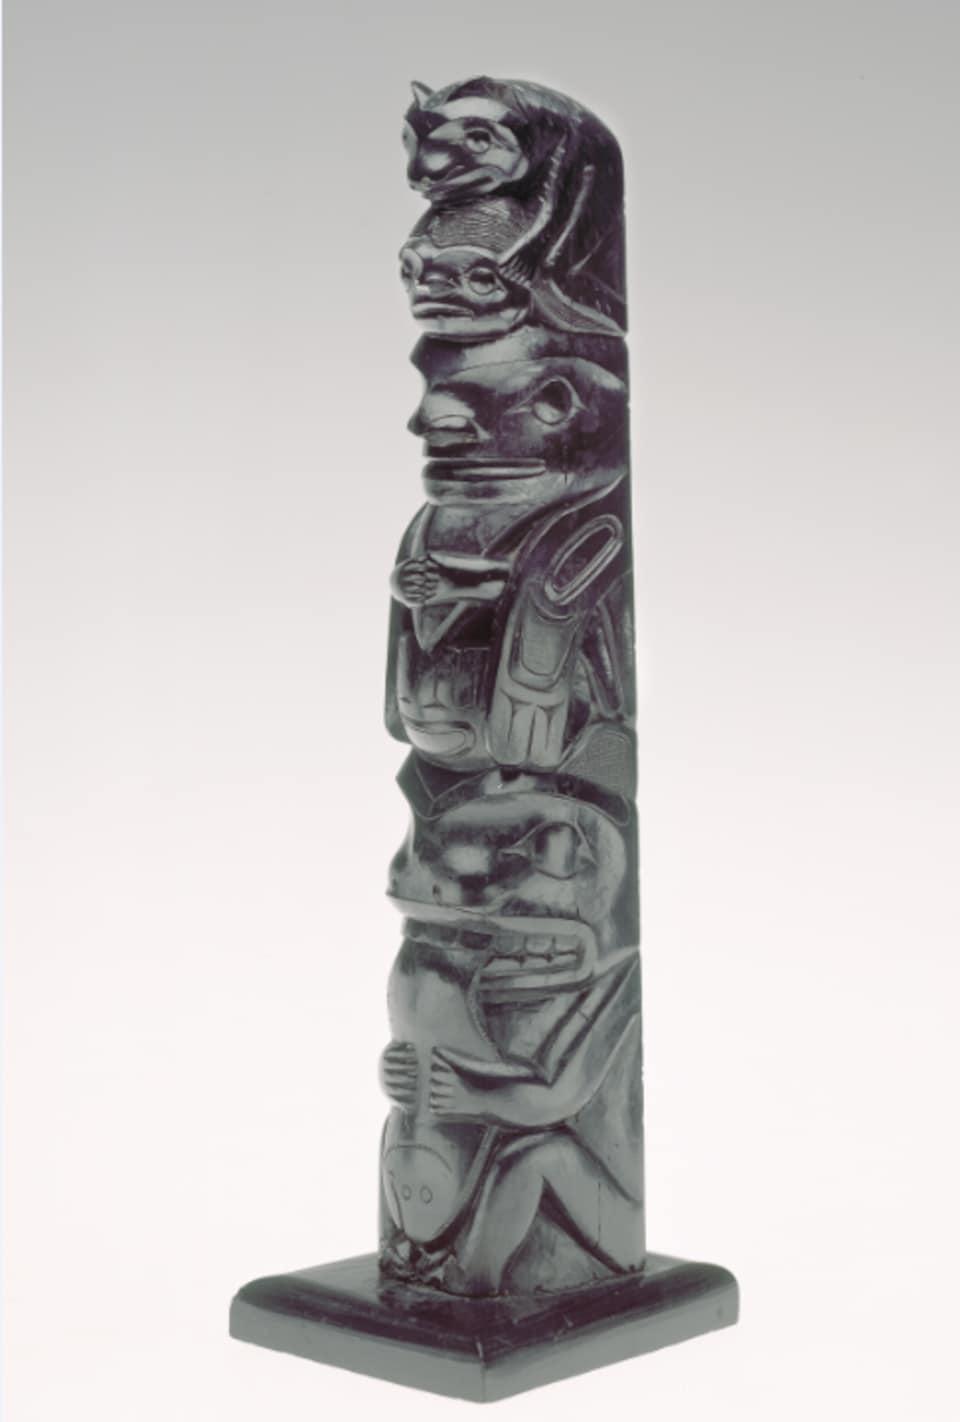 Un mât totémique miniature haïda.